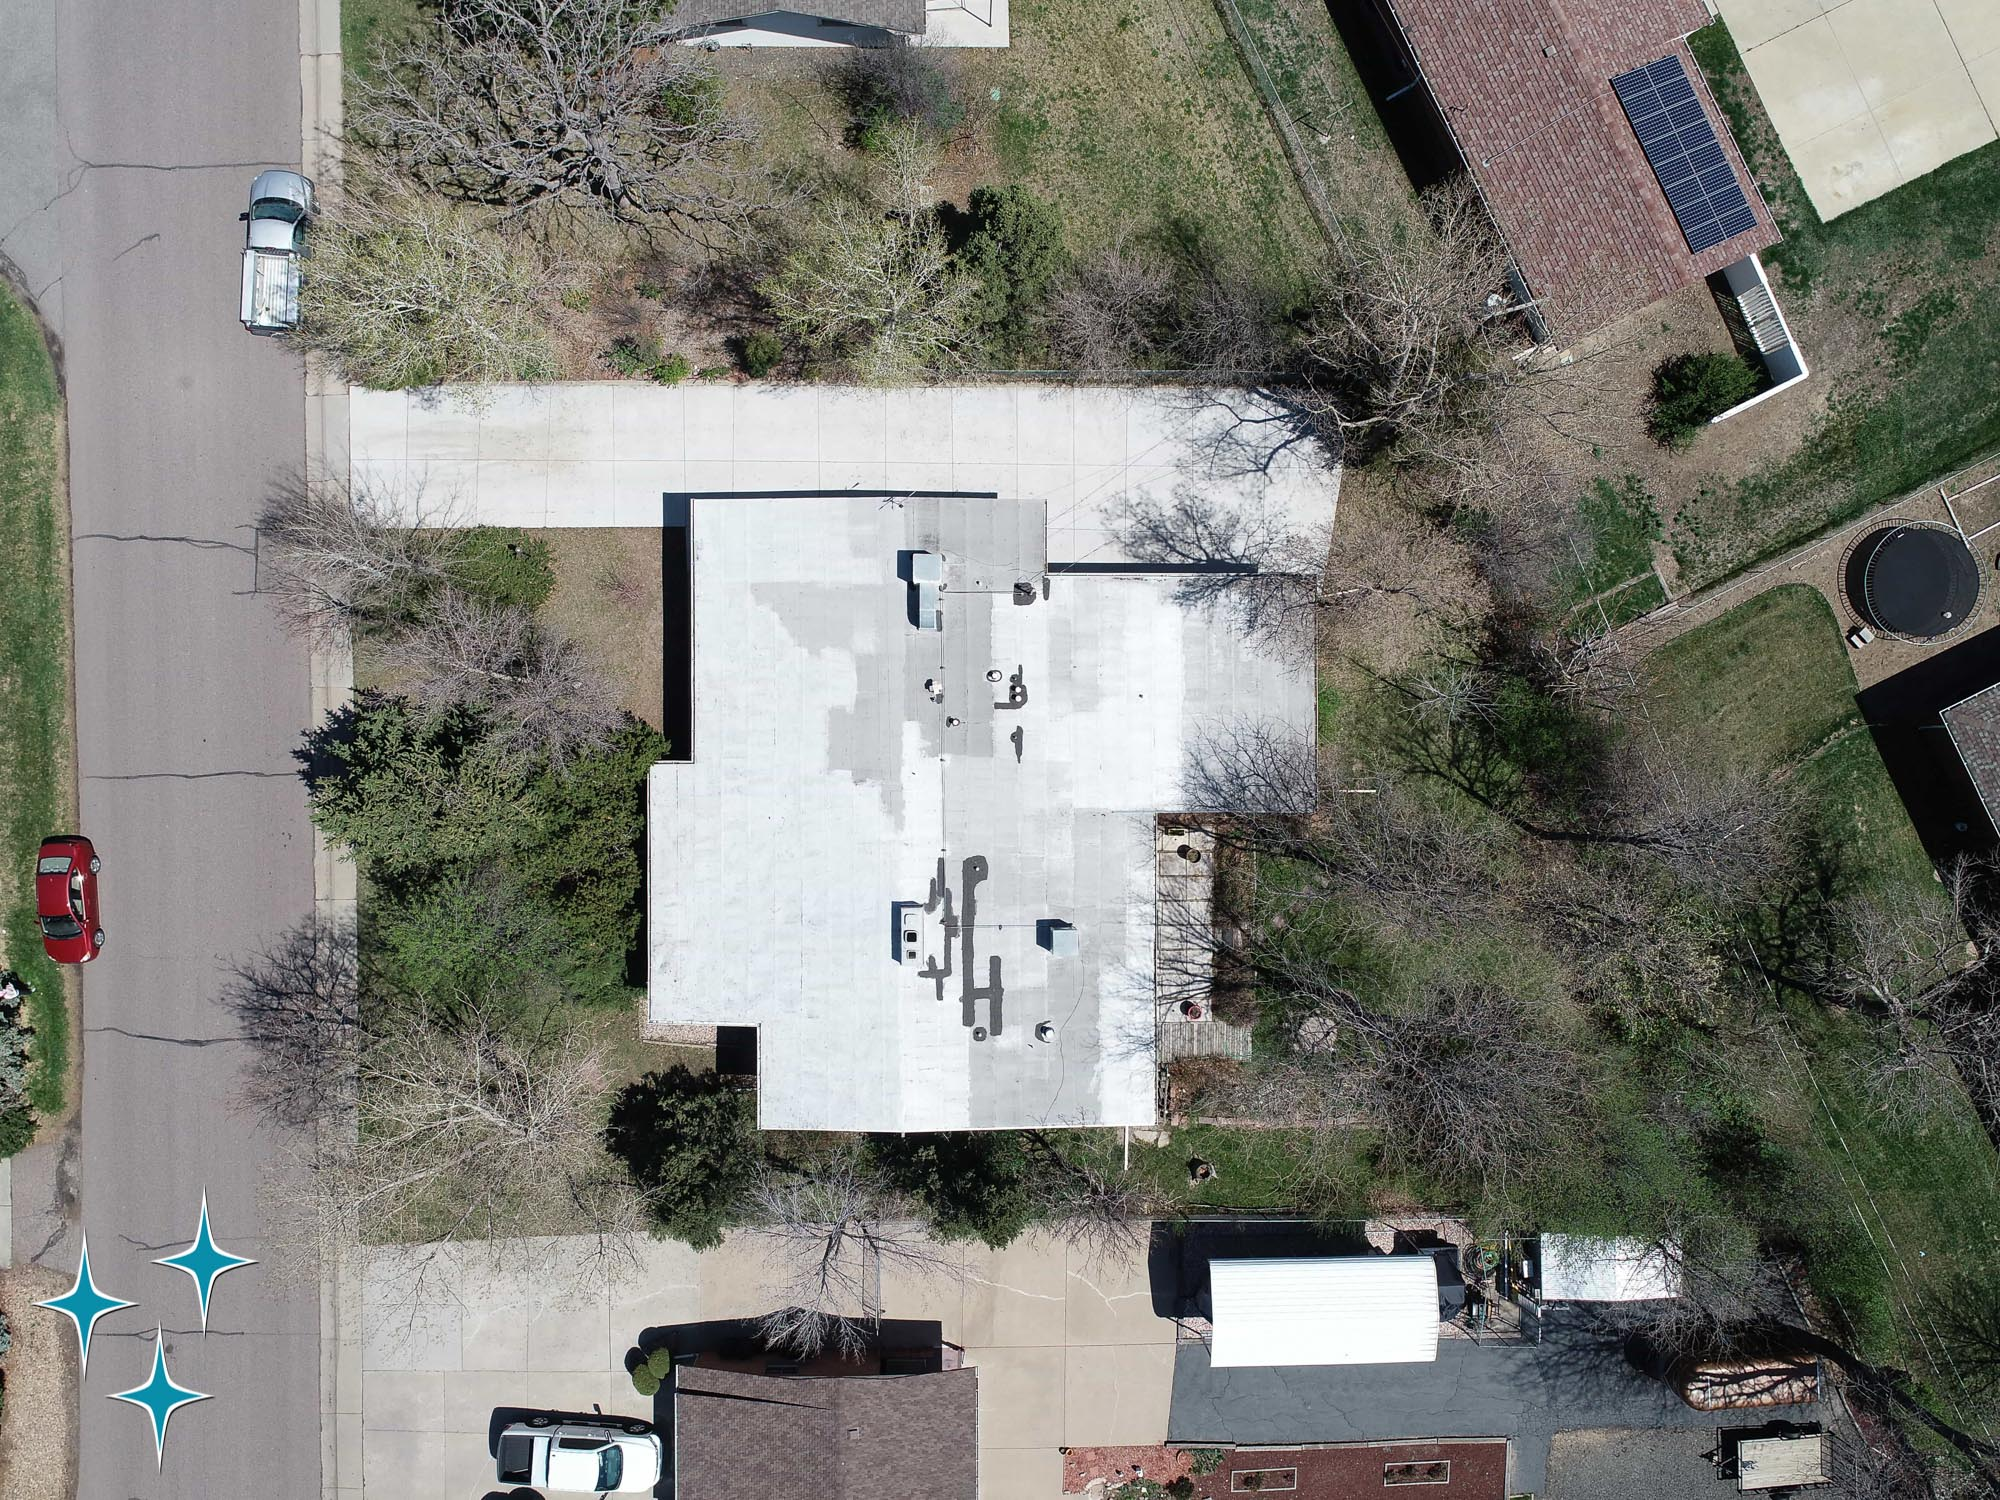 Adrian-Kinney-10350-W-35th-Ave-Wheat-Ridge-2000w50-3swm-92.jpg